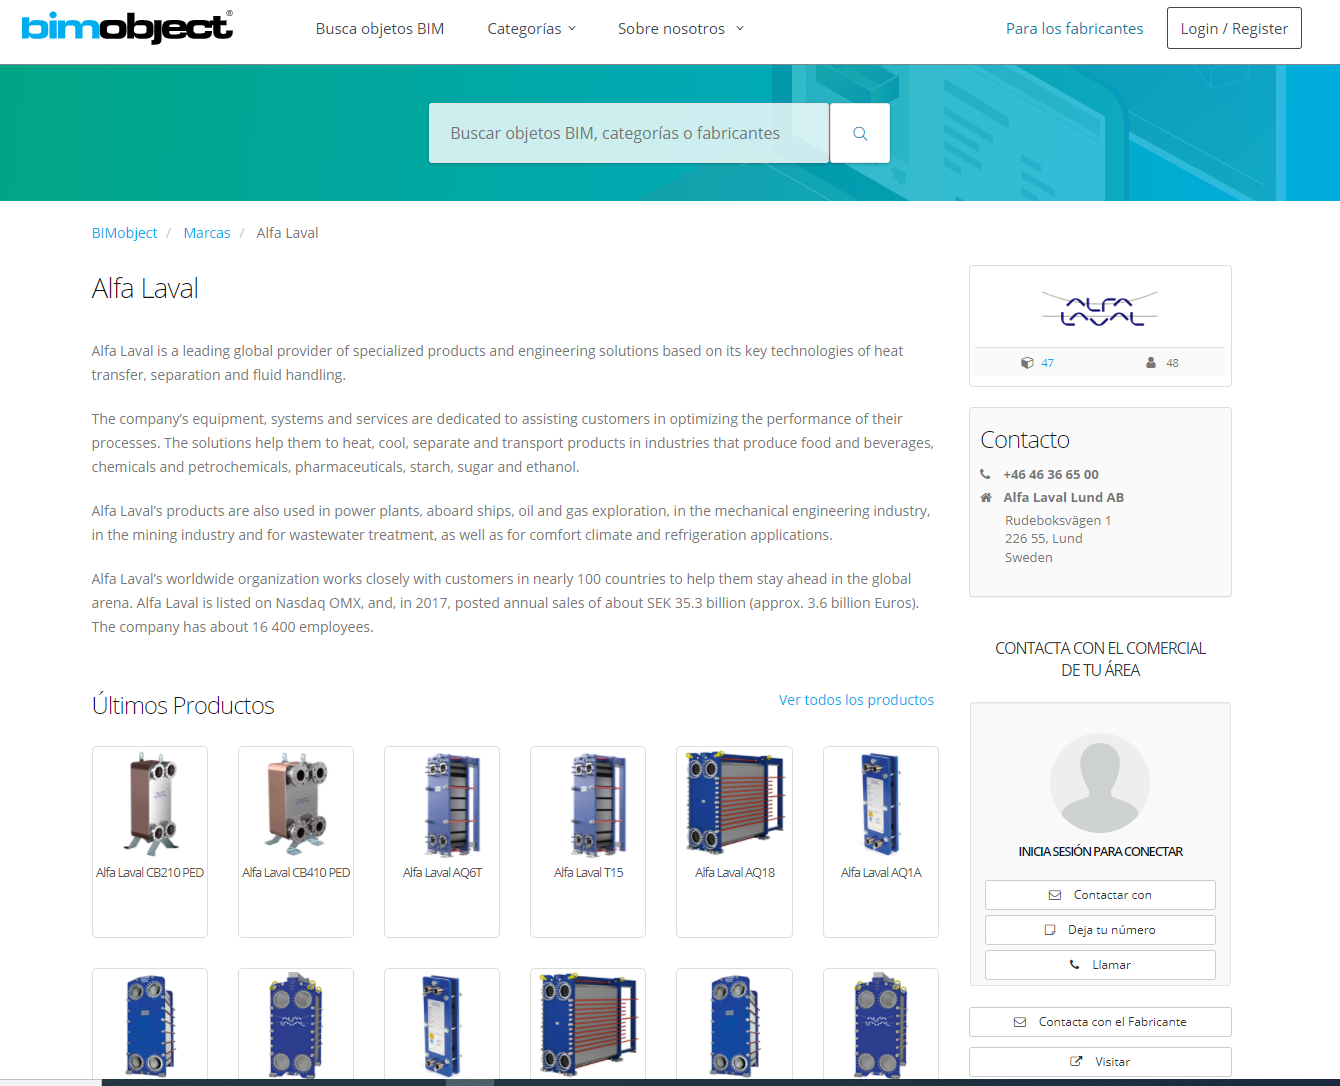 Intercambiadores de calor Alfa Laval en archivos BIM, consulta a tu distribuidor oficial T-Soluciona